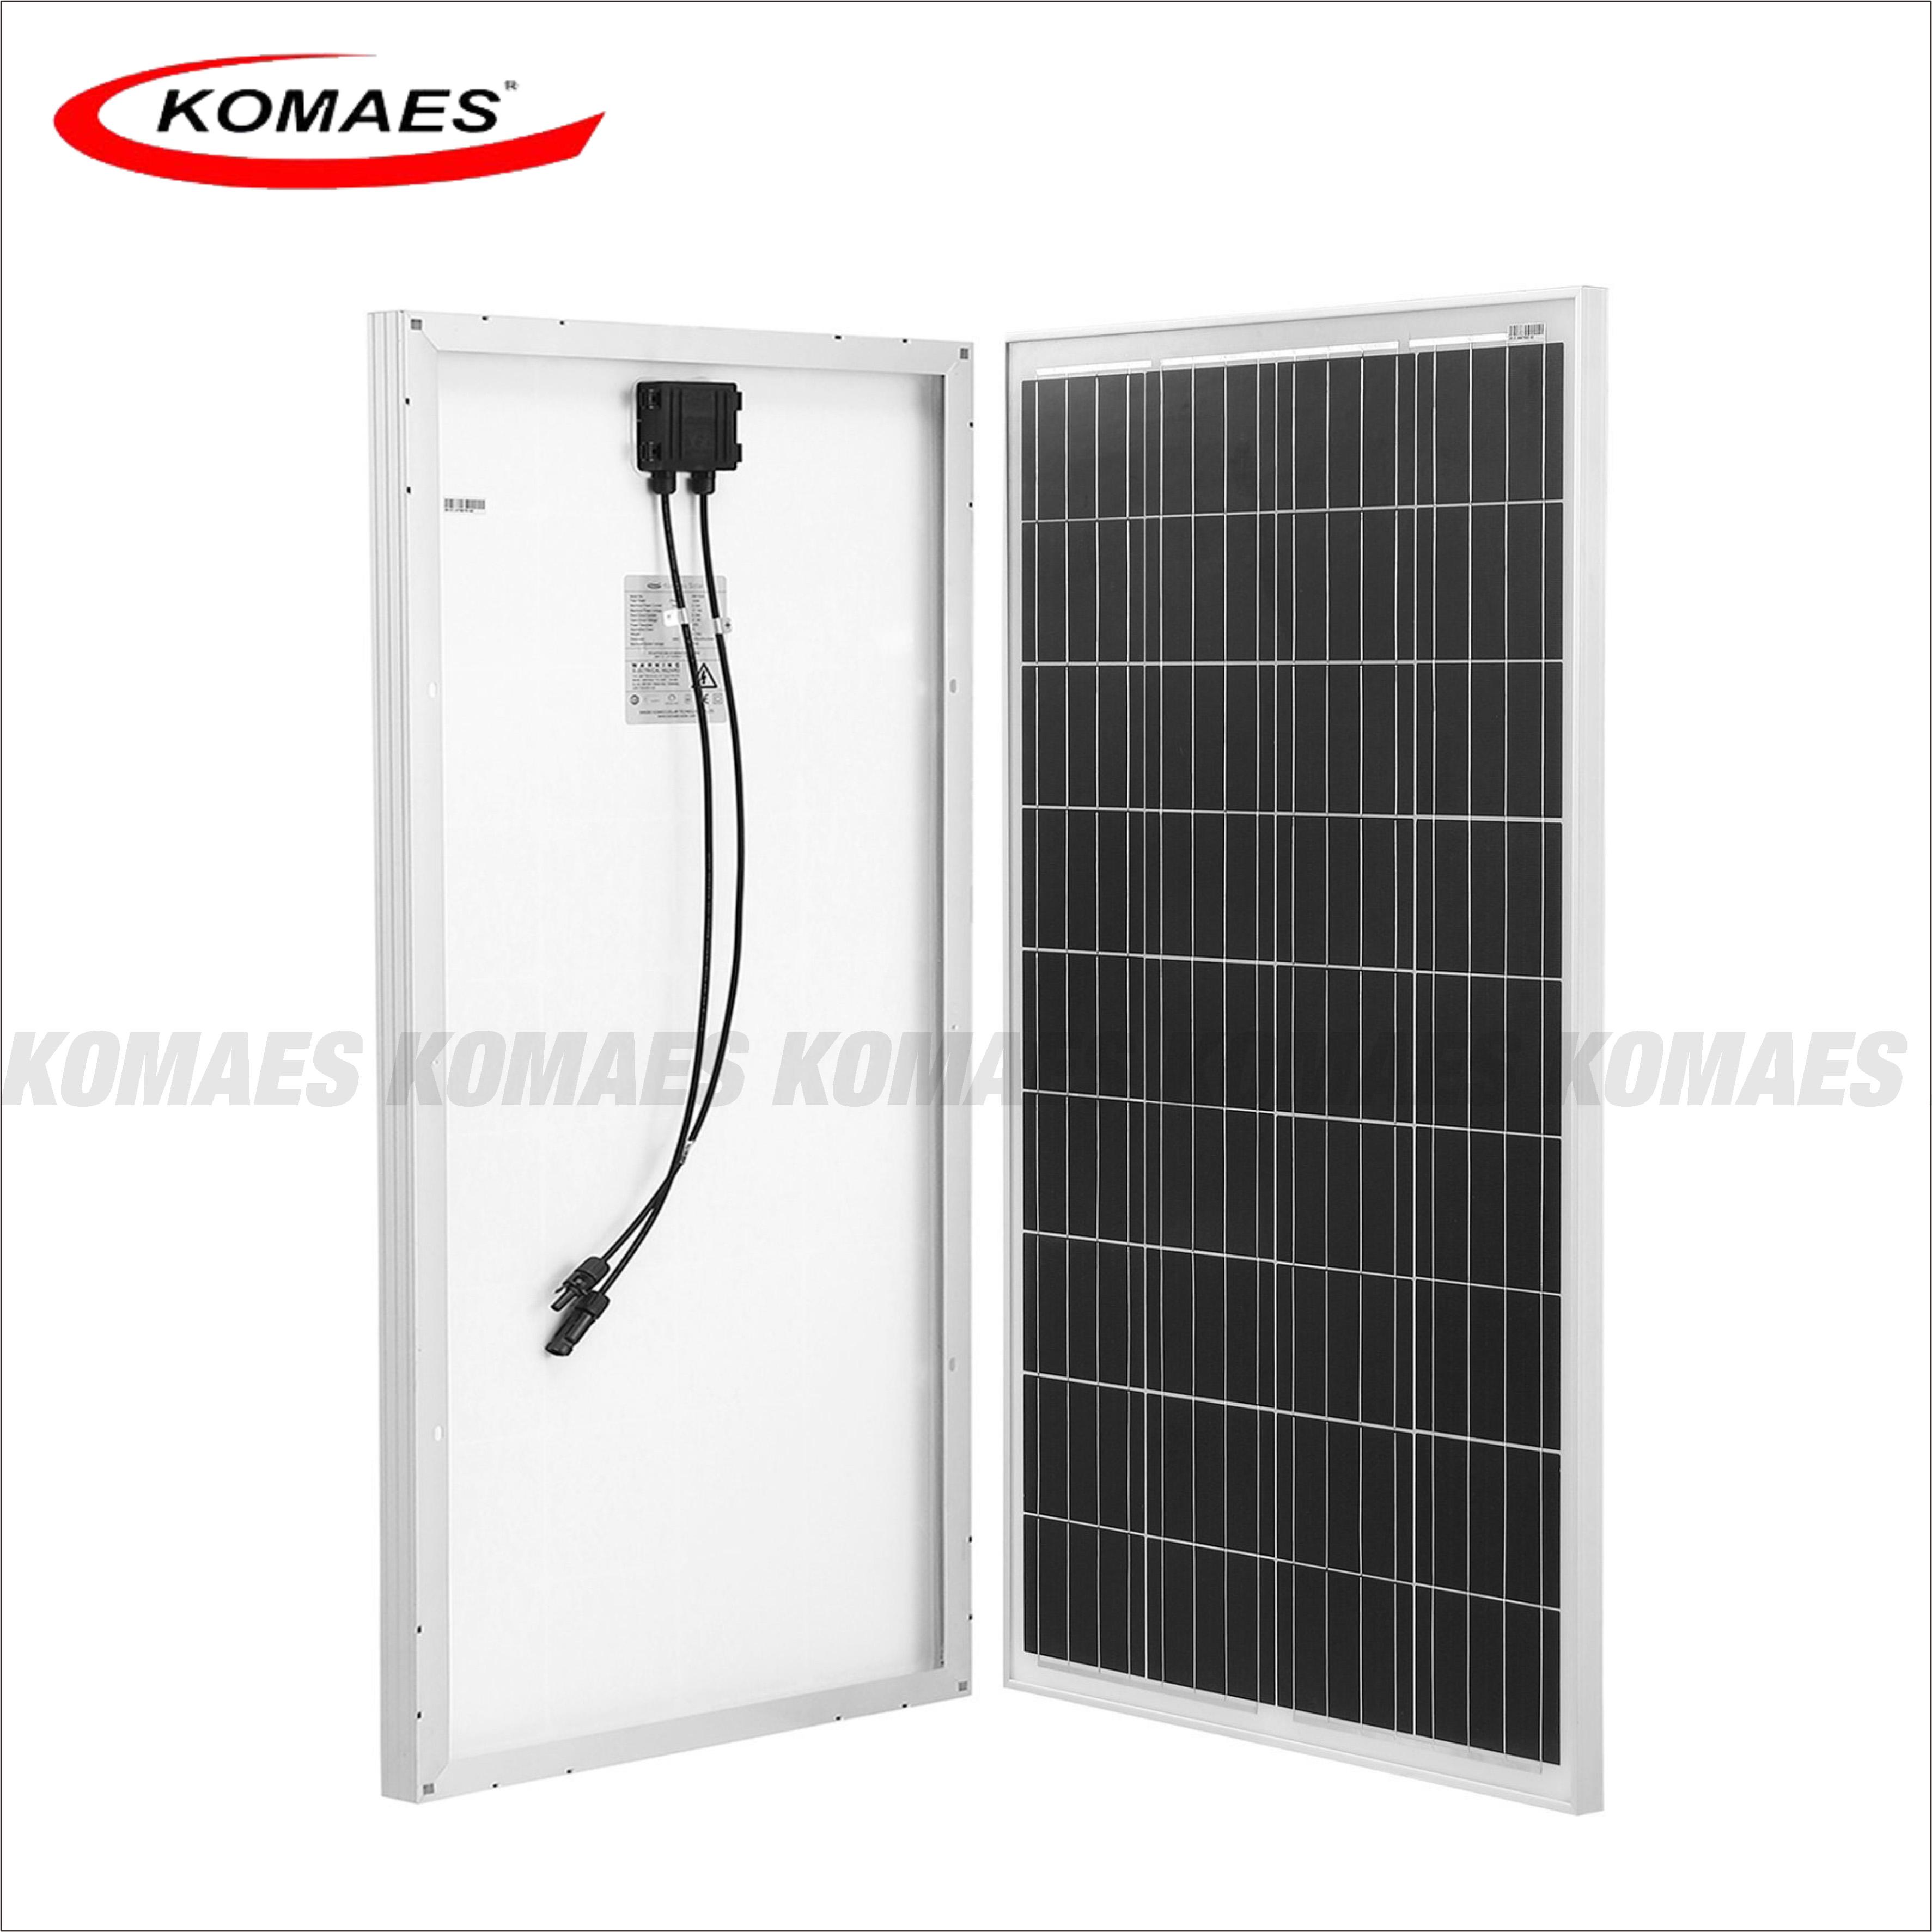 Komaes 12V 100 Watts Solar Panel Kit Poly for f Grid RV Boat